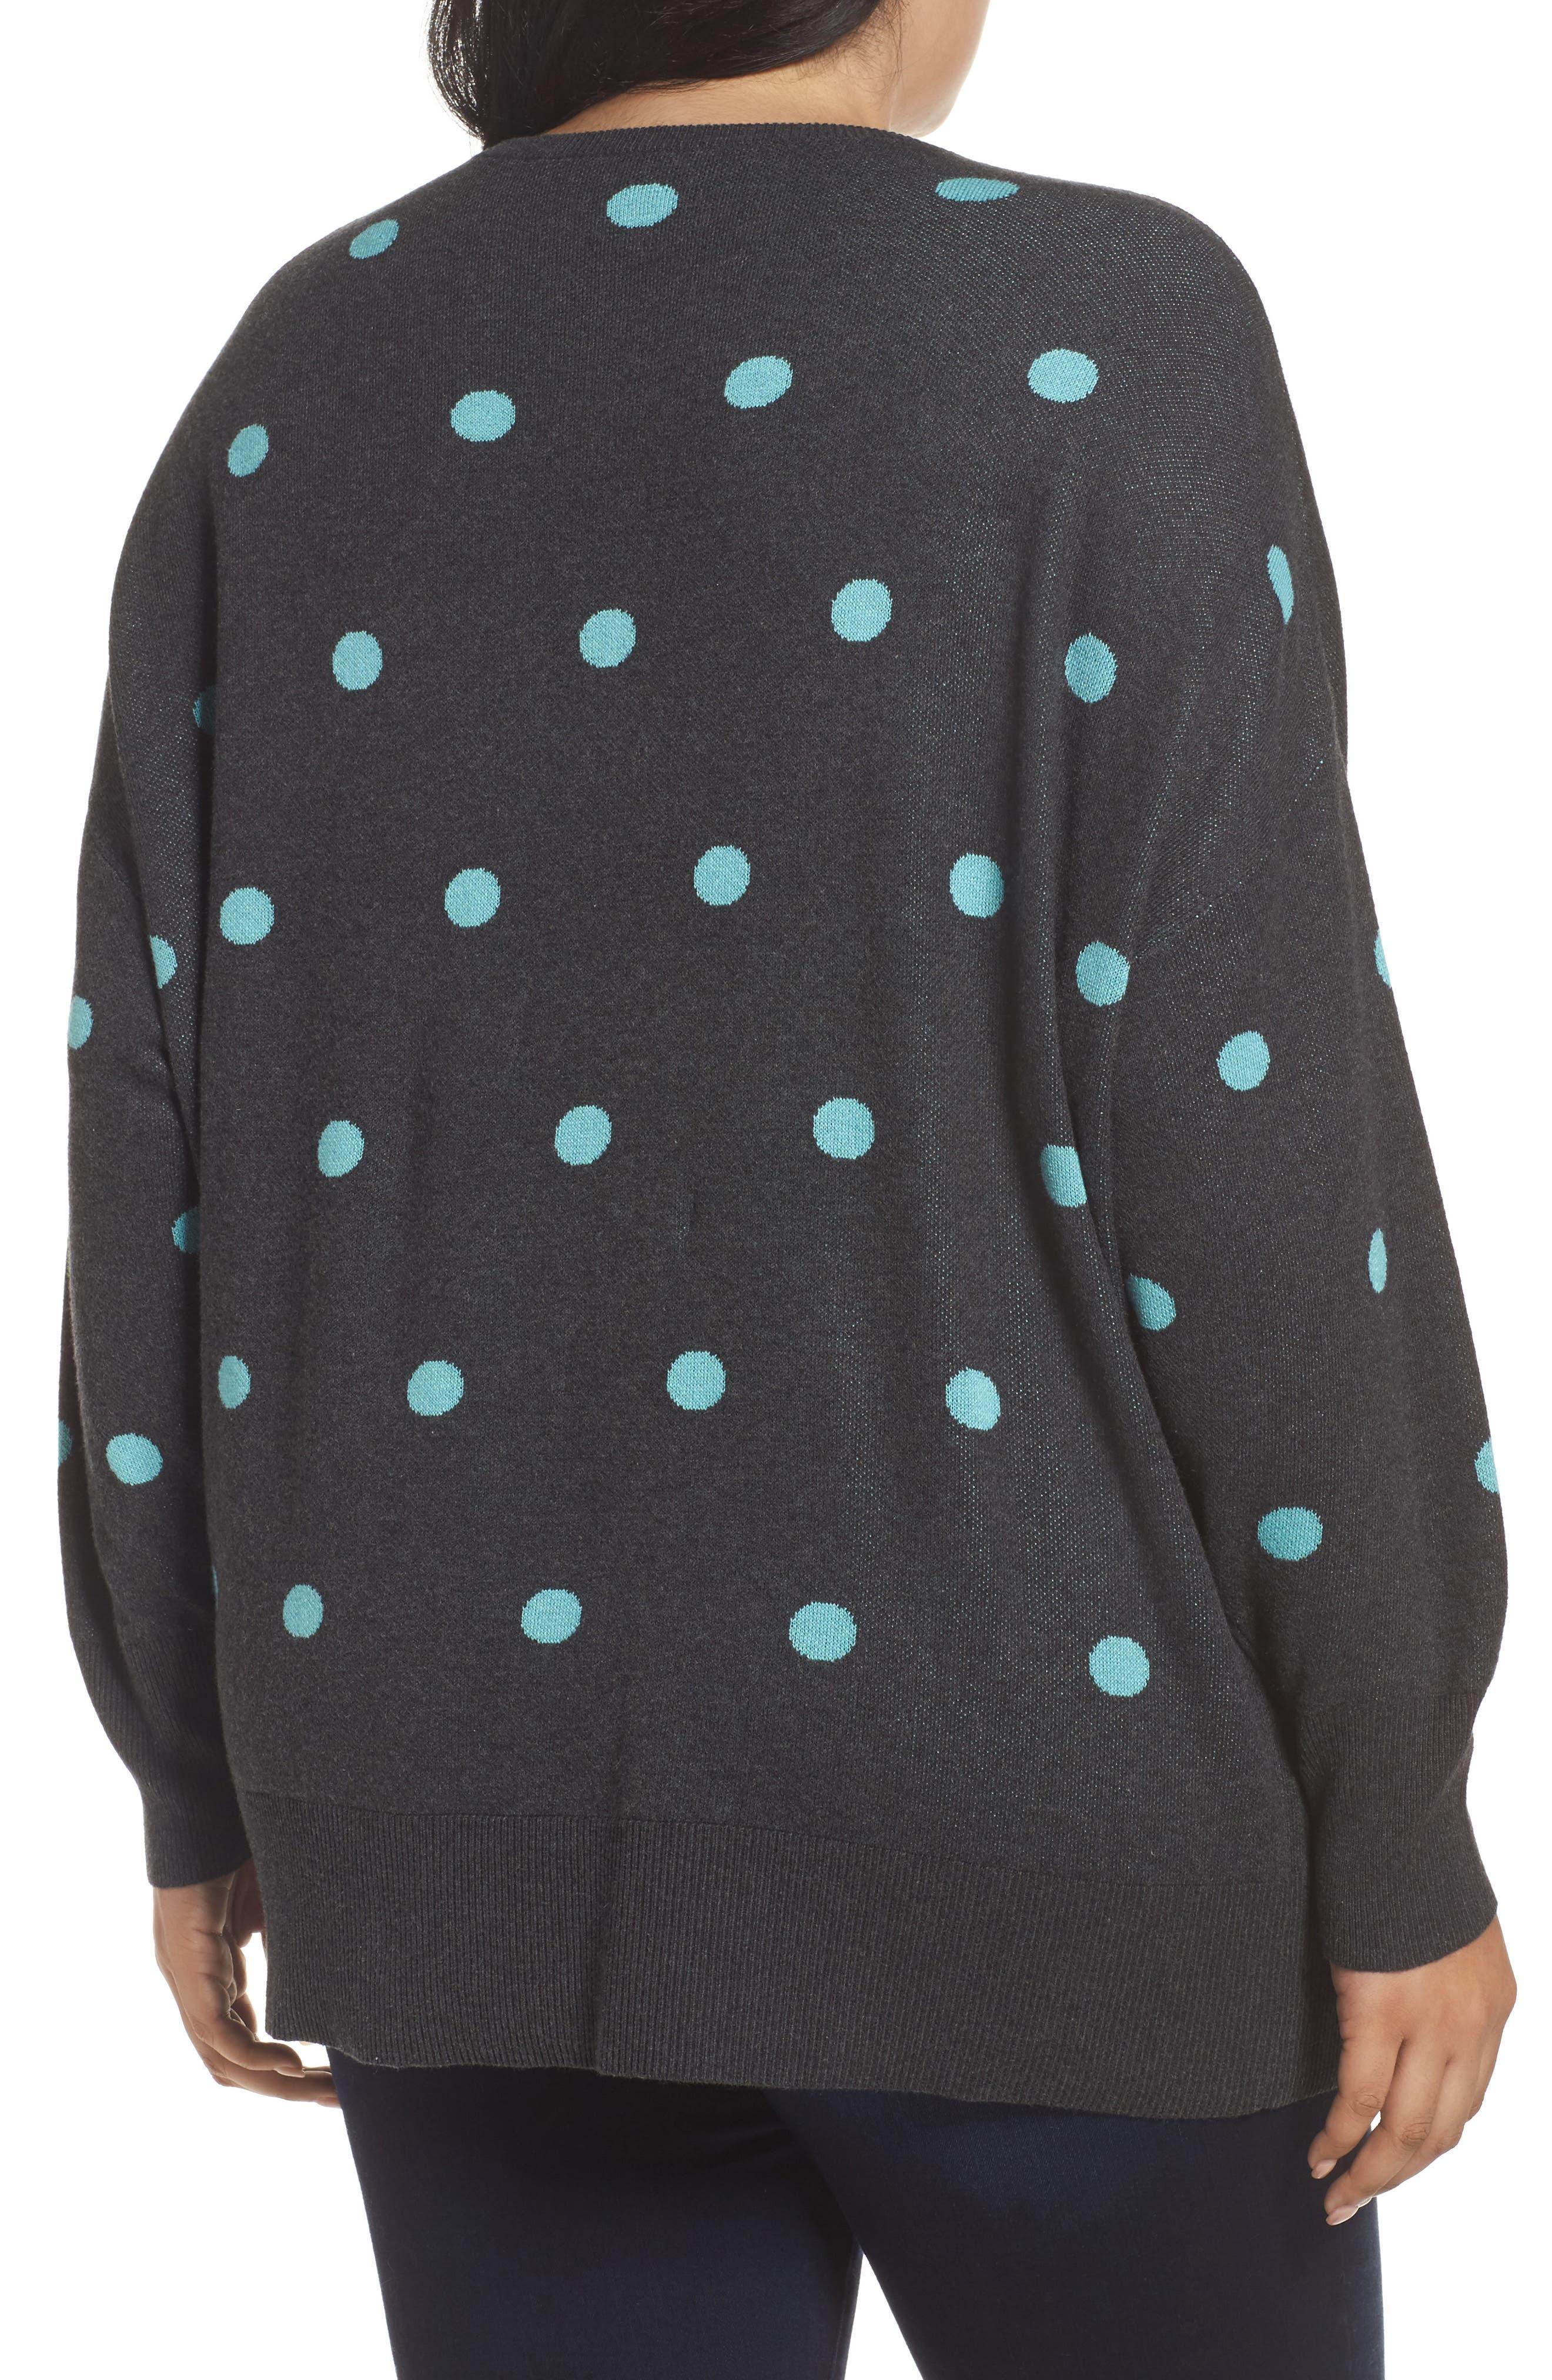 Dolman Sleeve Crewneck Sweater,                             Alternate thumbnail 8, color,